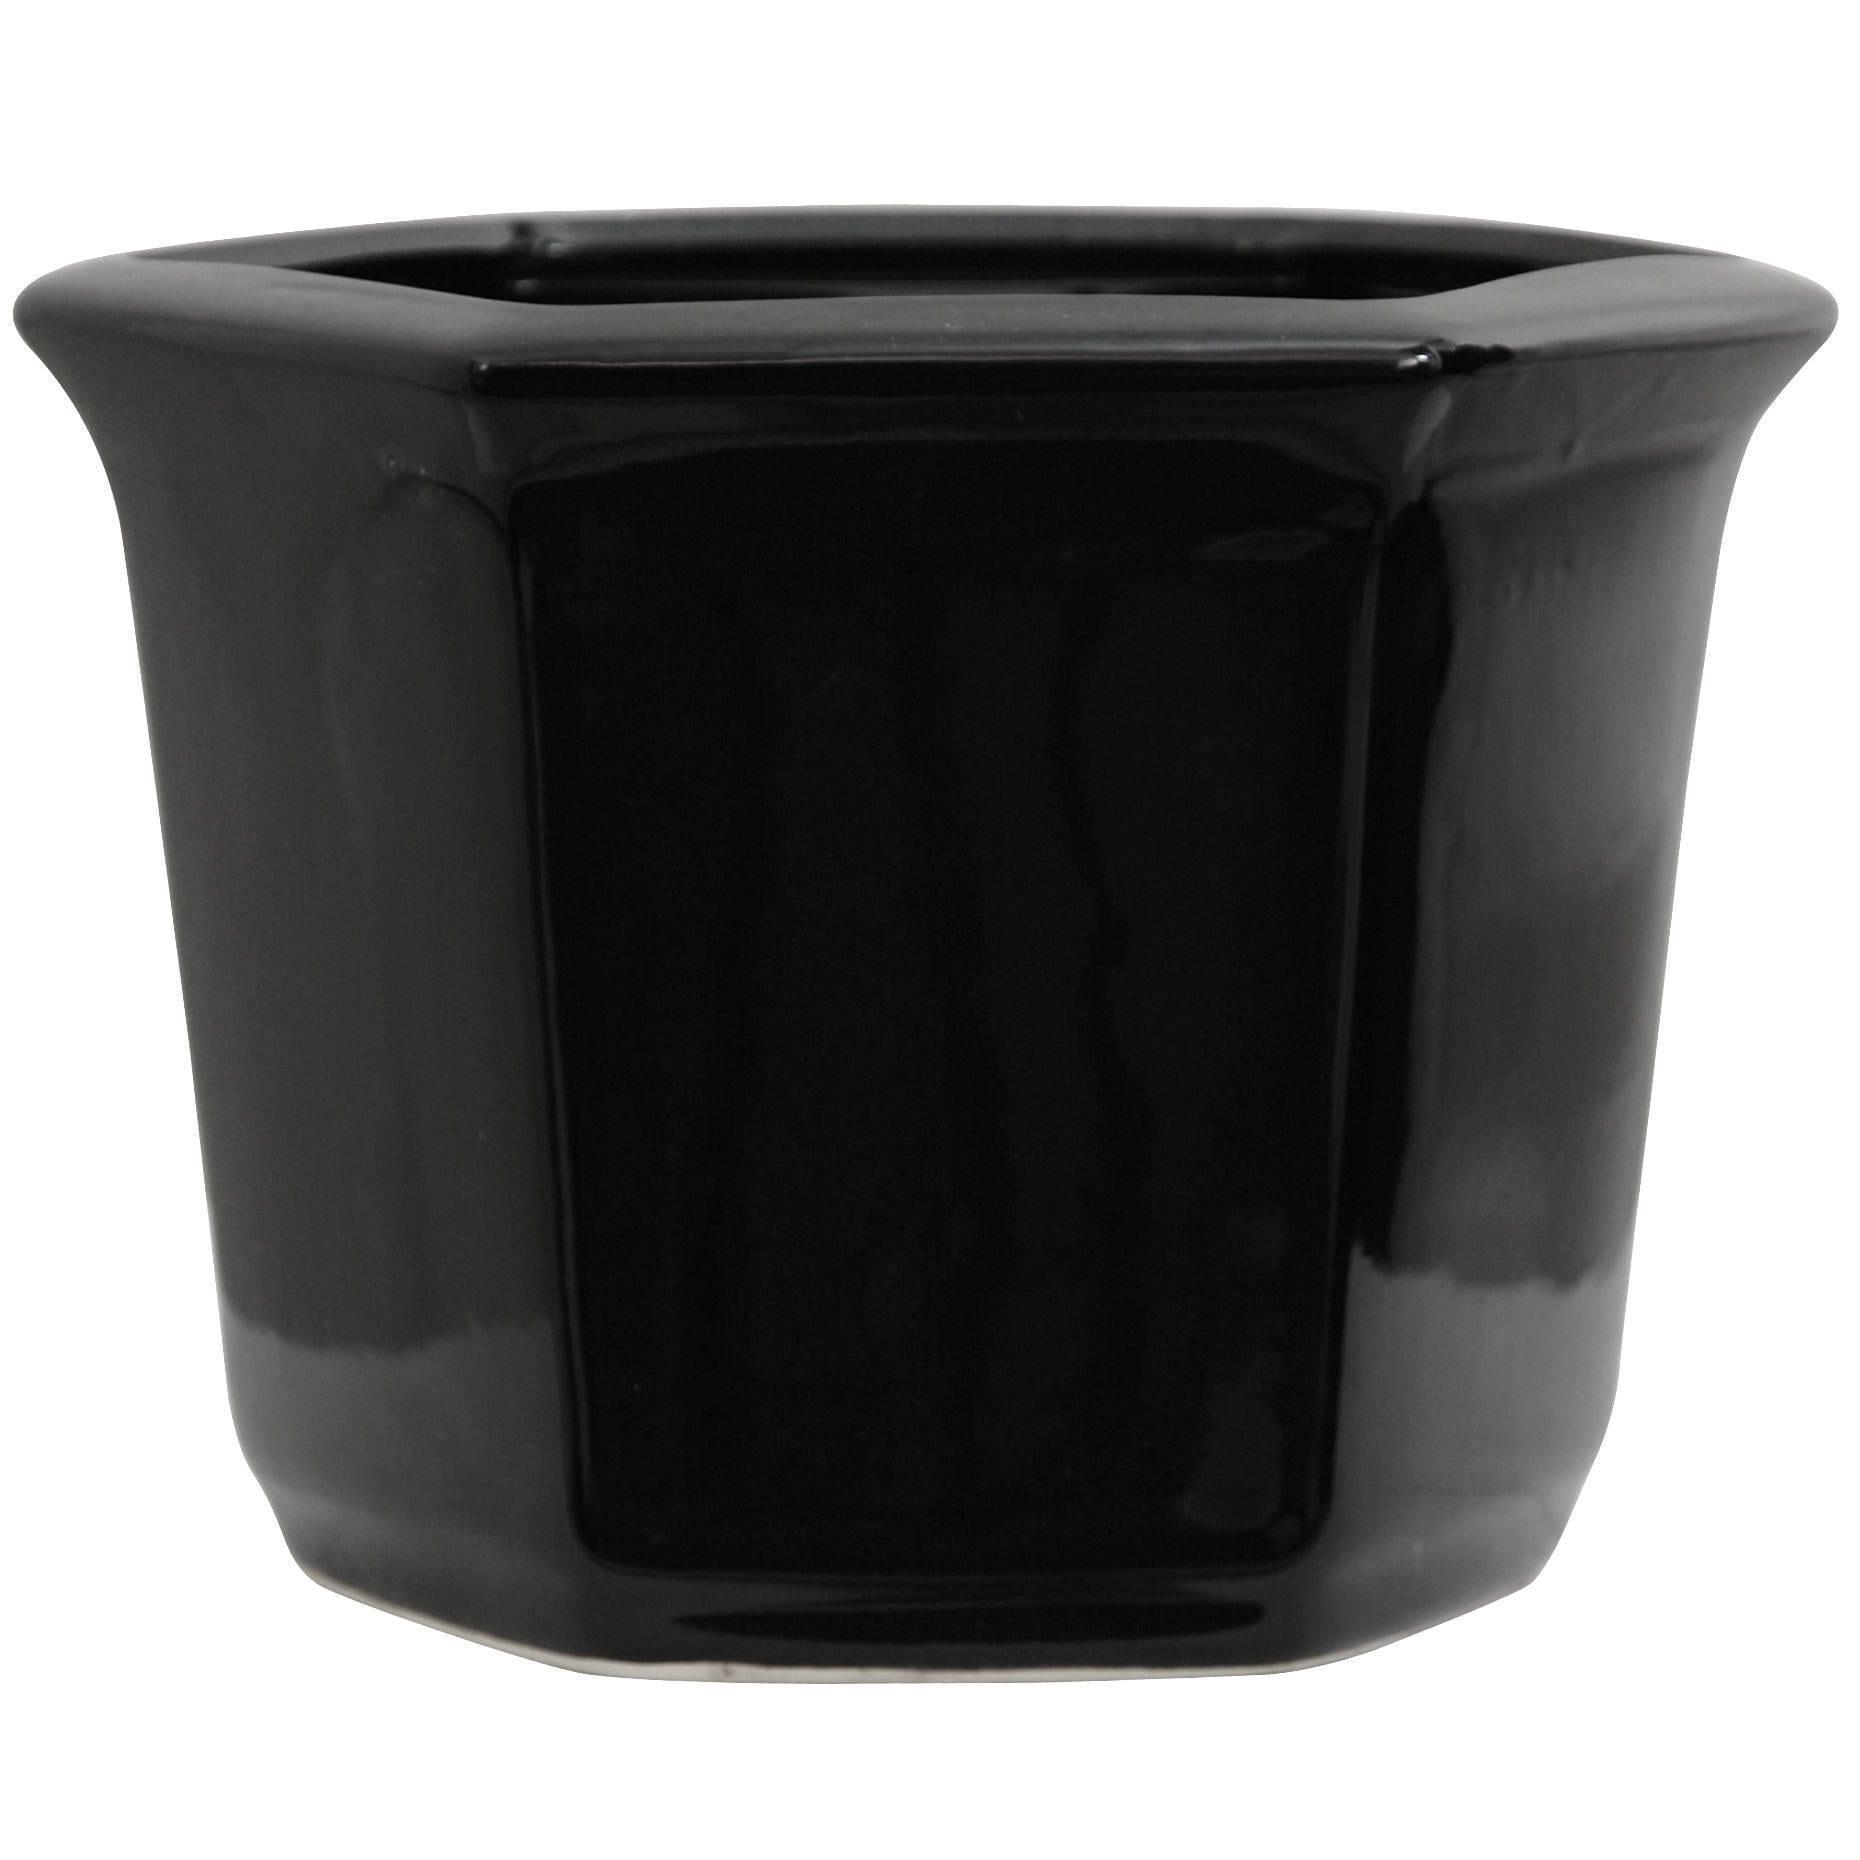 Handmade Porcelain 10-inch Solid Black Flower Pot Planter...